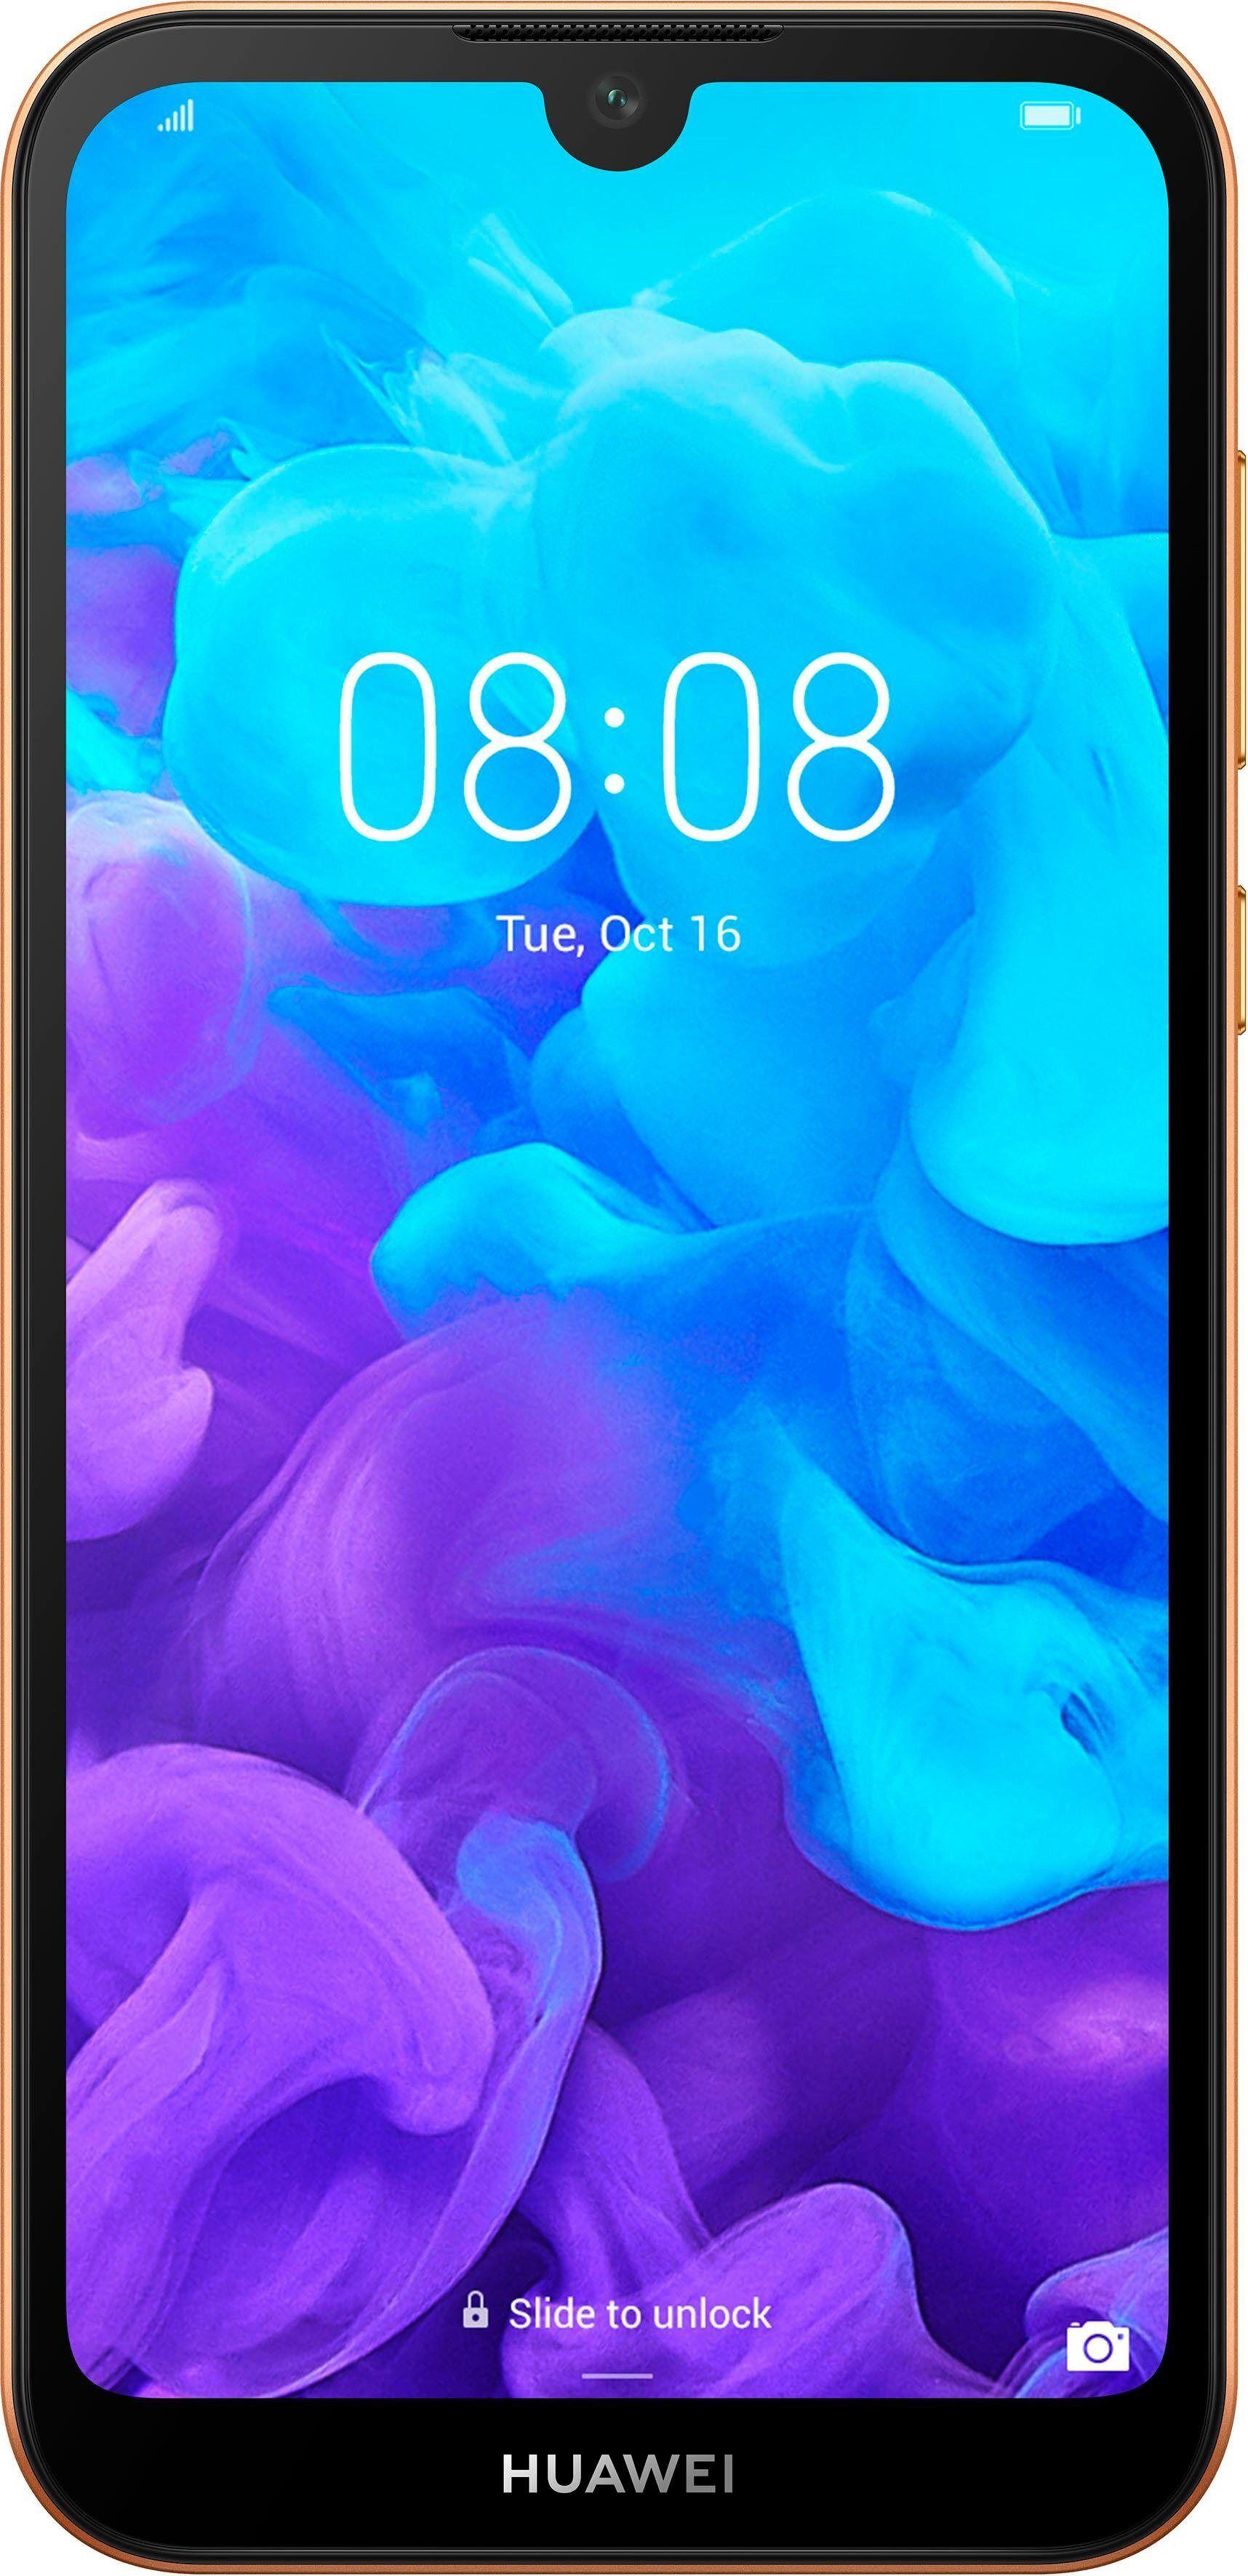 Huawei Y5 2019 Smartphone (14,5 cm/5,7 Zoll, 16 GB Speicherplatz, 13 MP Kamera), Amber Brown